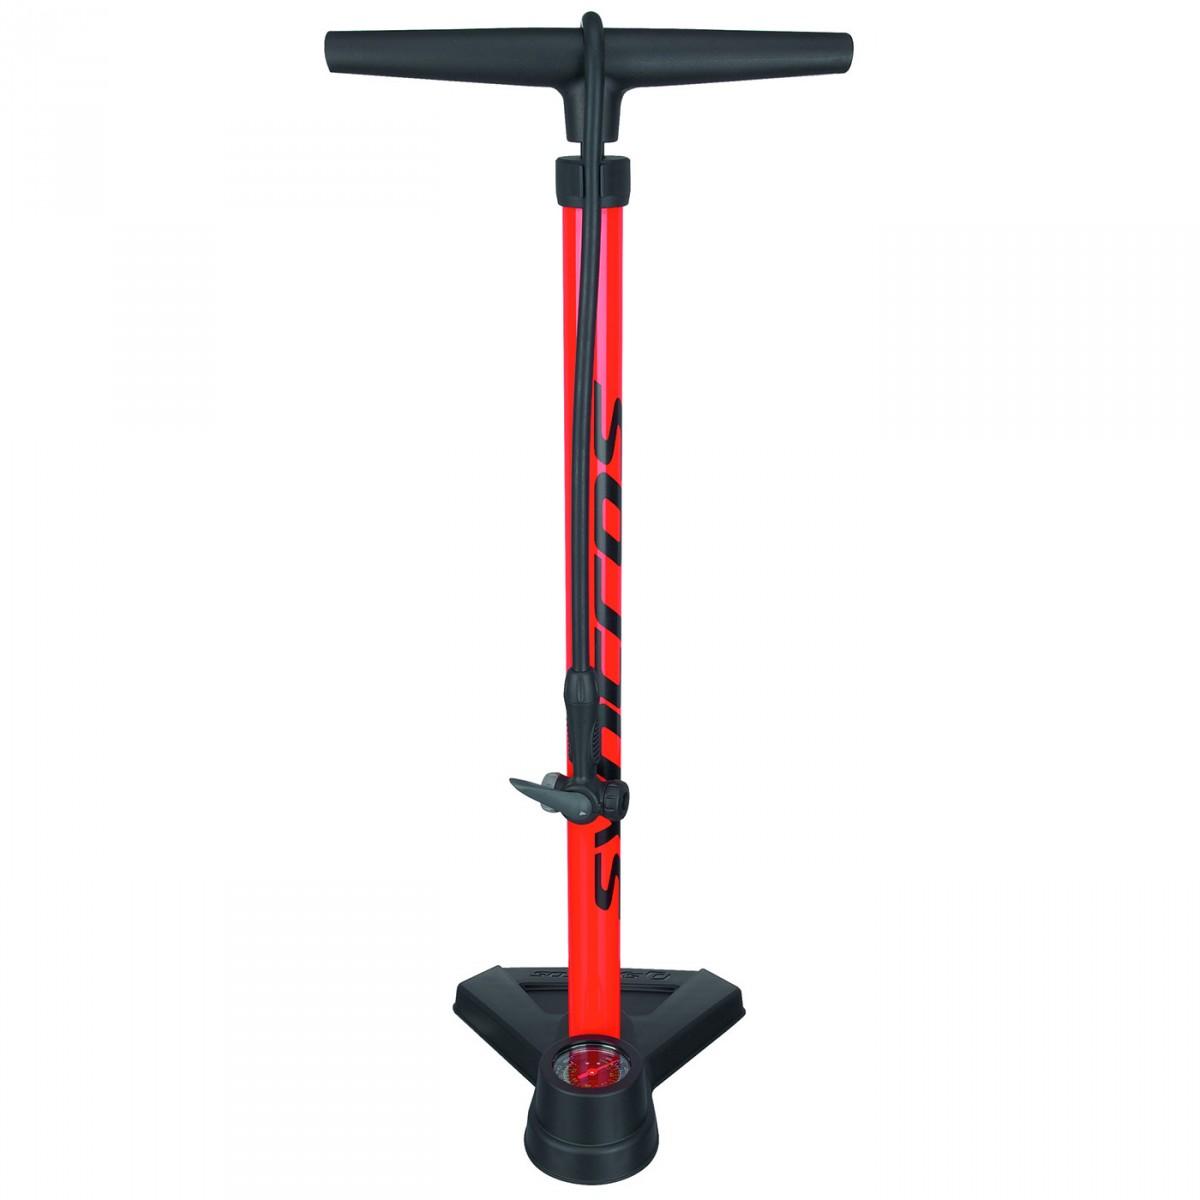 pompe pied scott syncros fp3 0 accessoires cyclisme. Black Bedroom Furniture Sets. Home Design Ideas